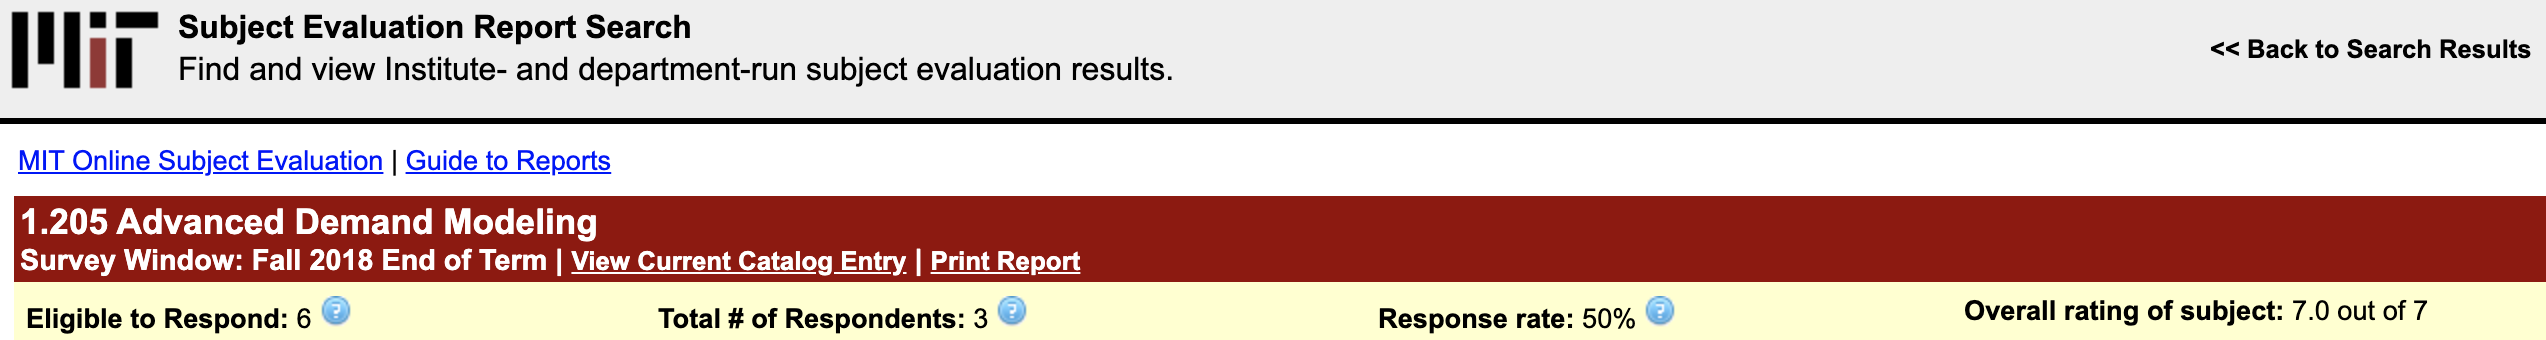 screenshot of course evaluation website